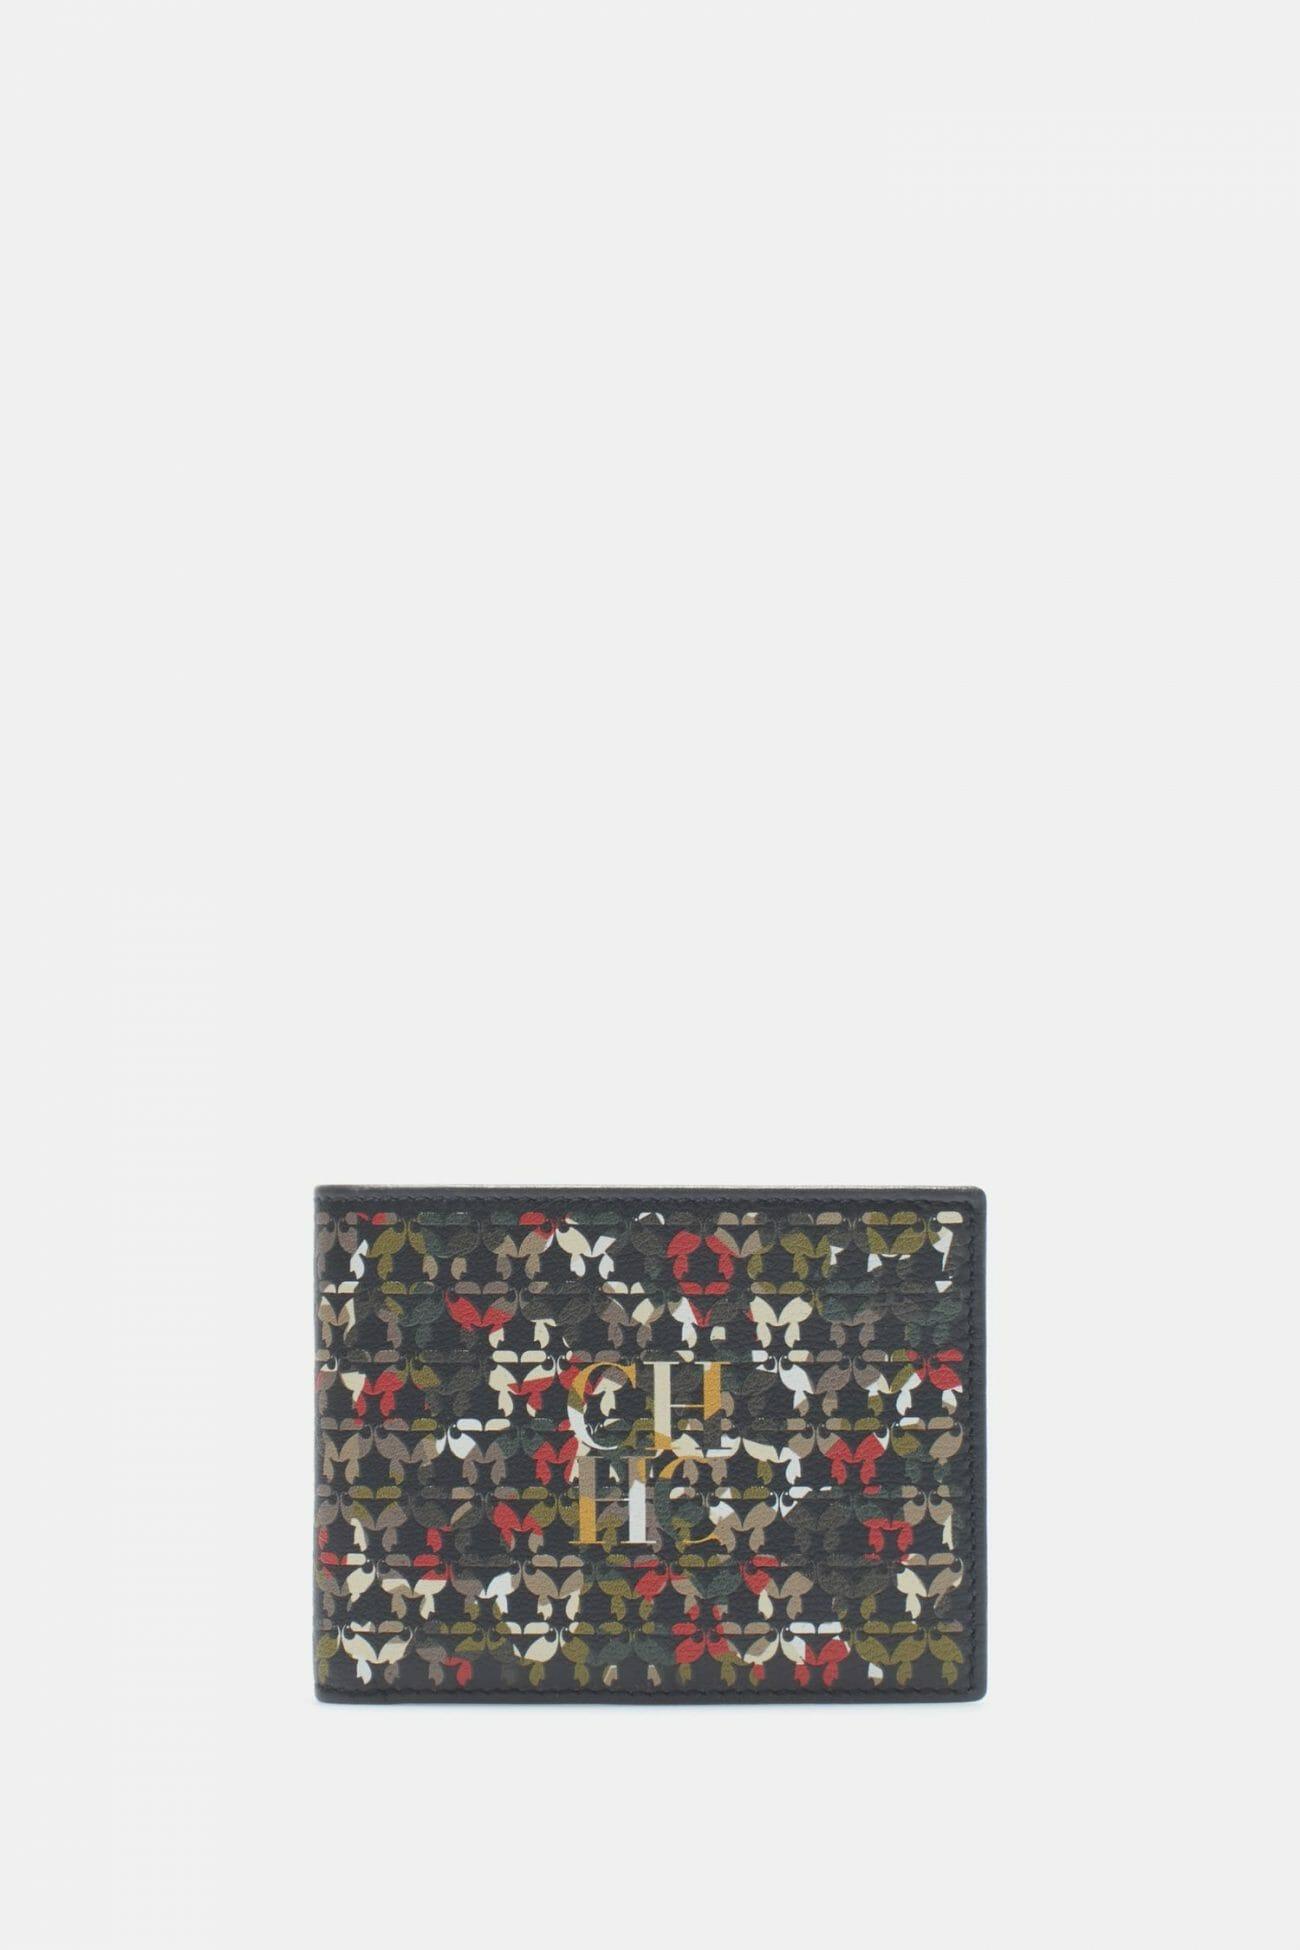 CH-Carolina-herrera-men-accessories-look-6